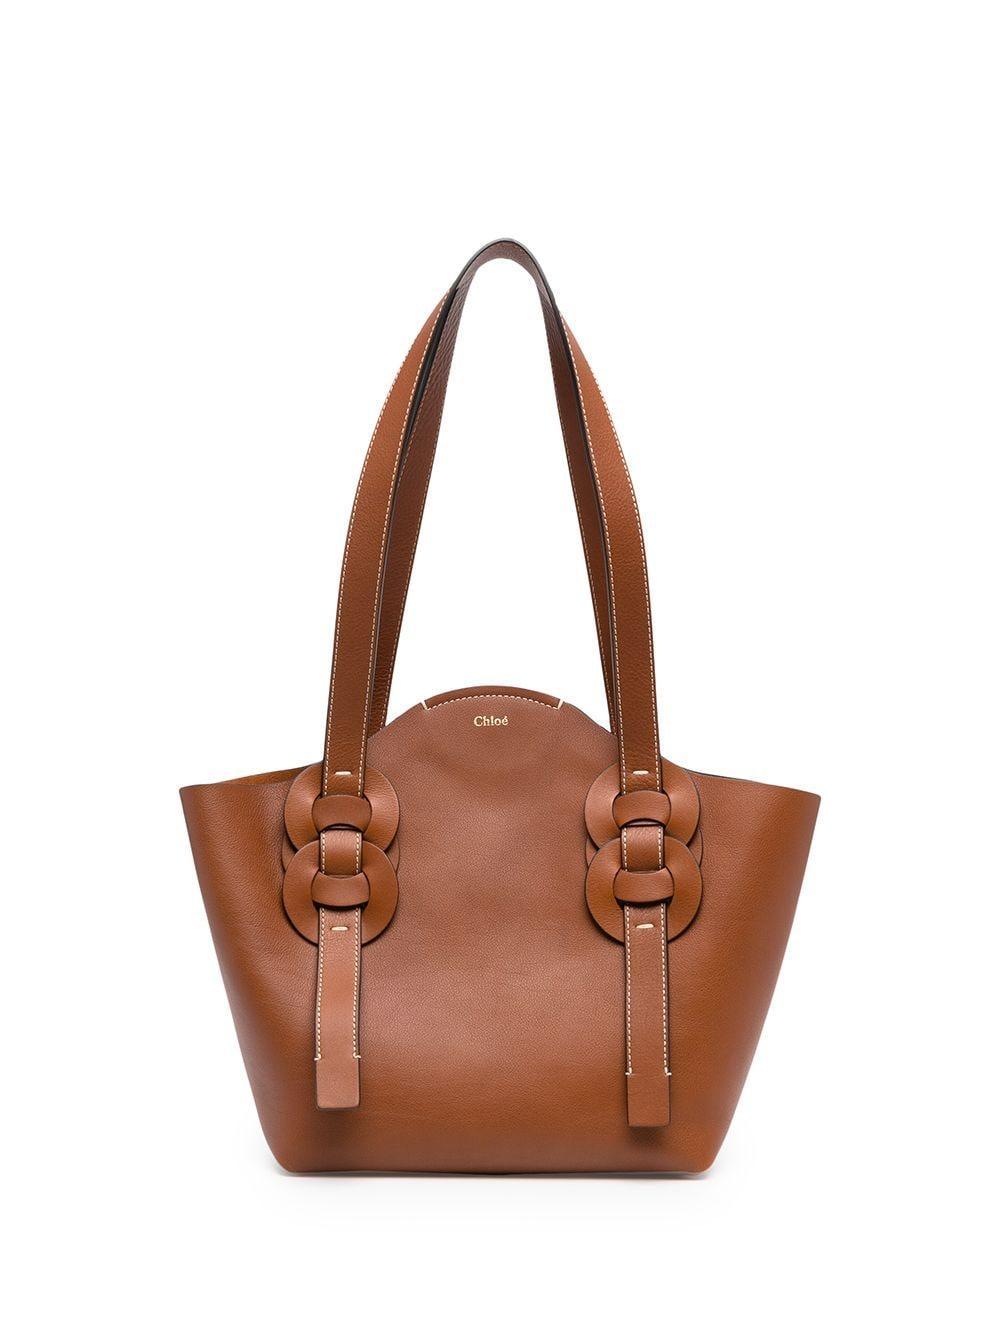 Darryl Small Tote Bag